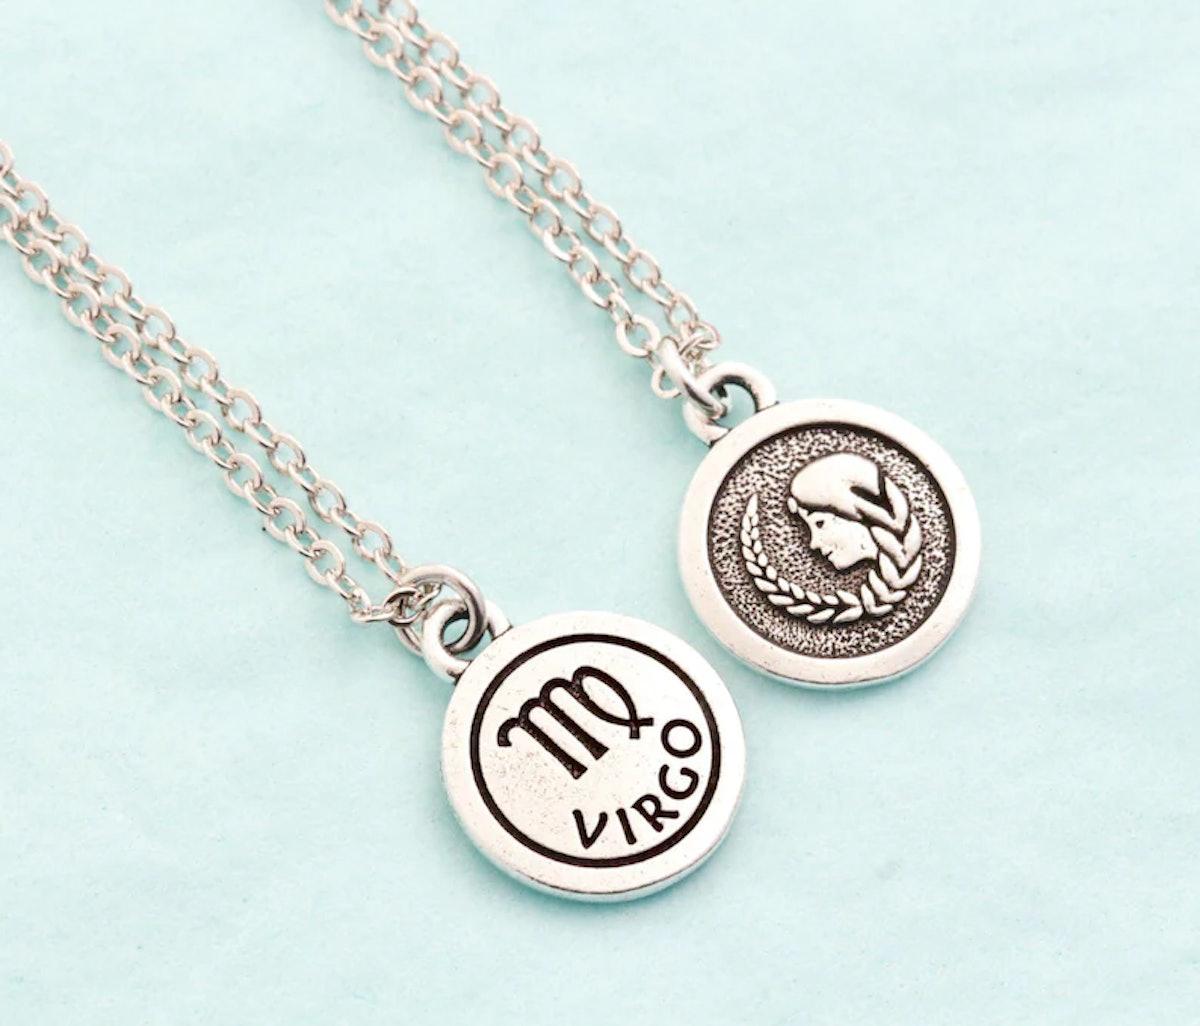 JacarandaDesigns Silver Virgo Necklace